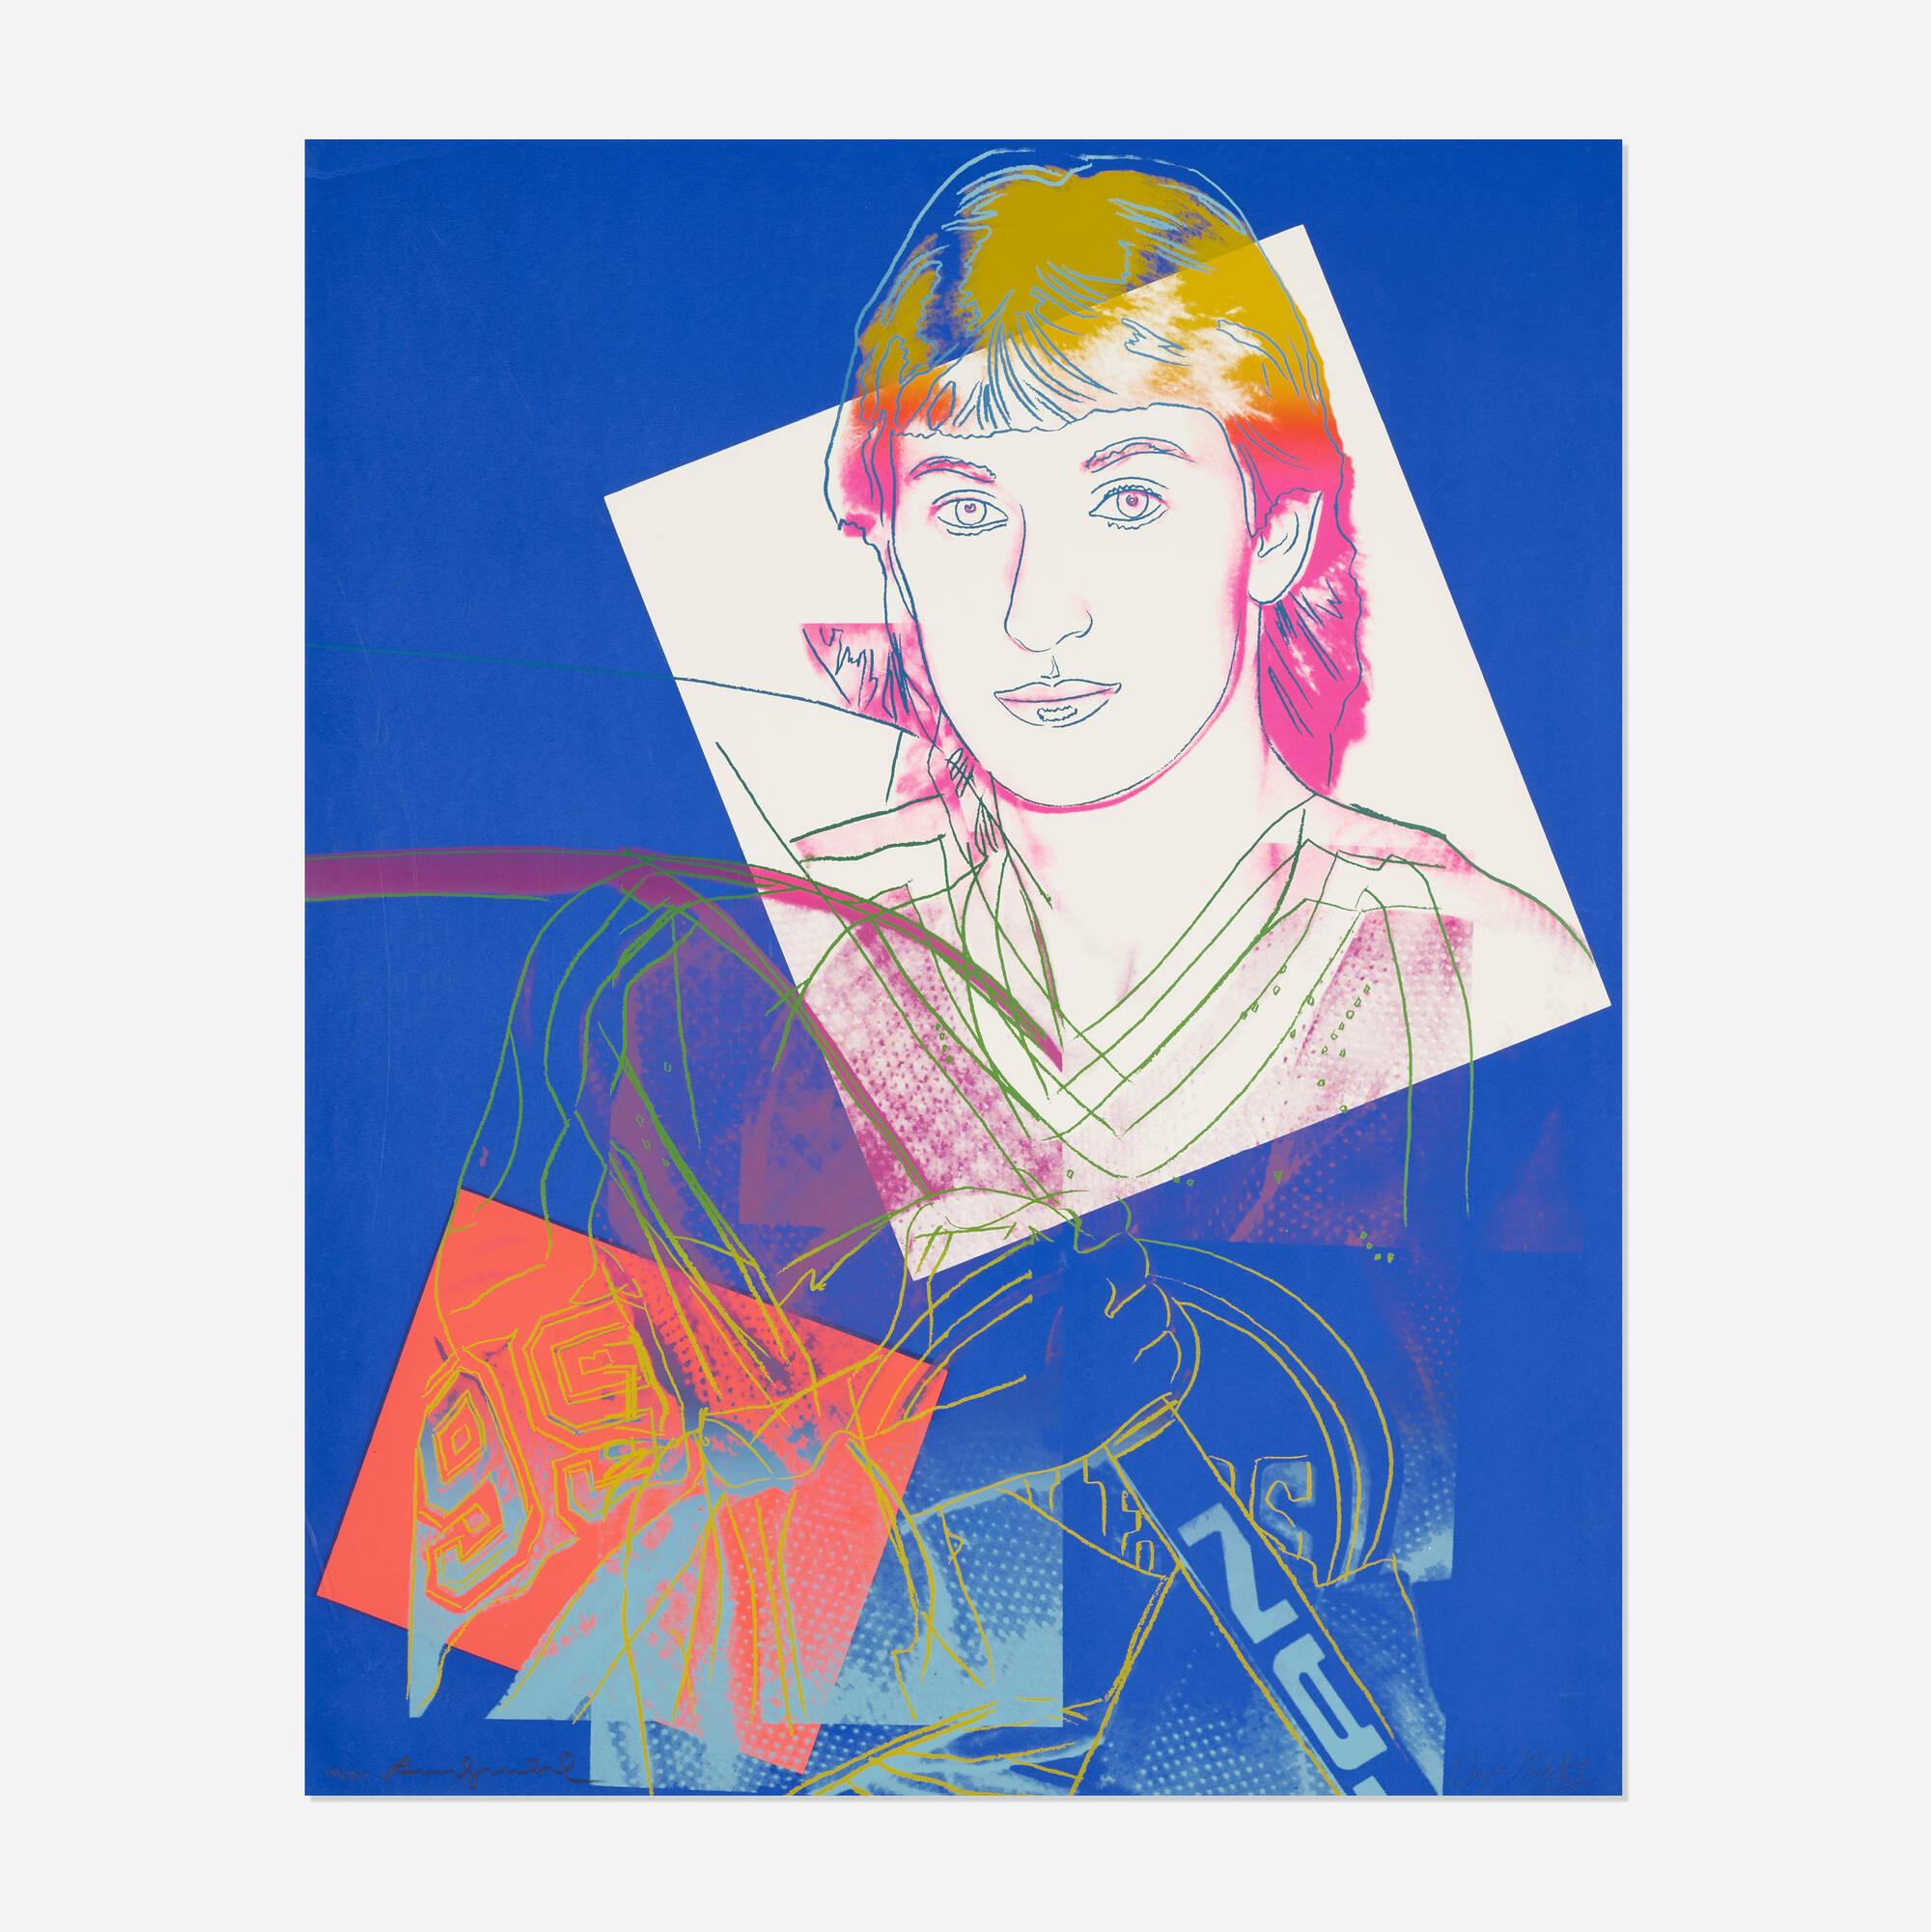 118: Andy Warhol / Wayne Gretzky #99 (1 of 1)